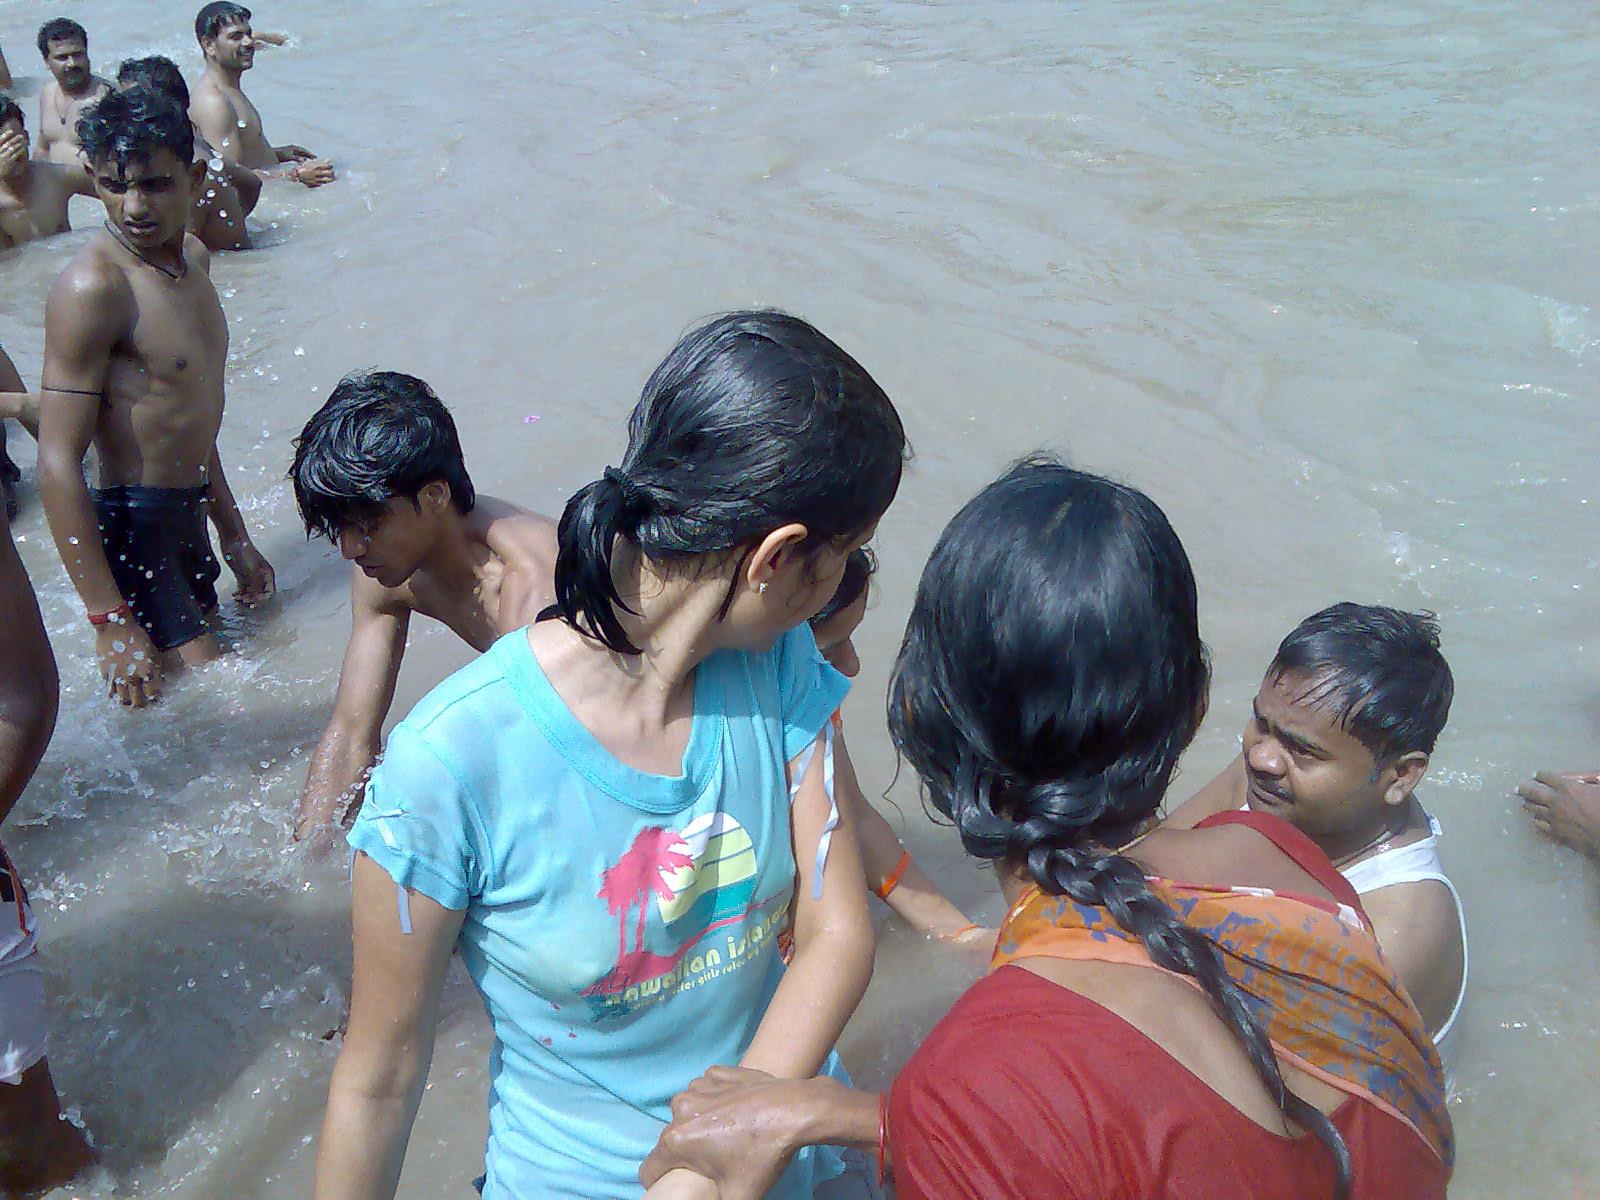 Wet Indian Girls In Ganga River Bathing Dress Girl